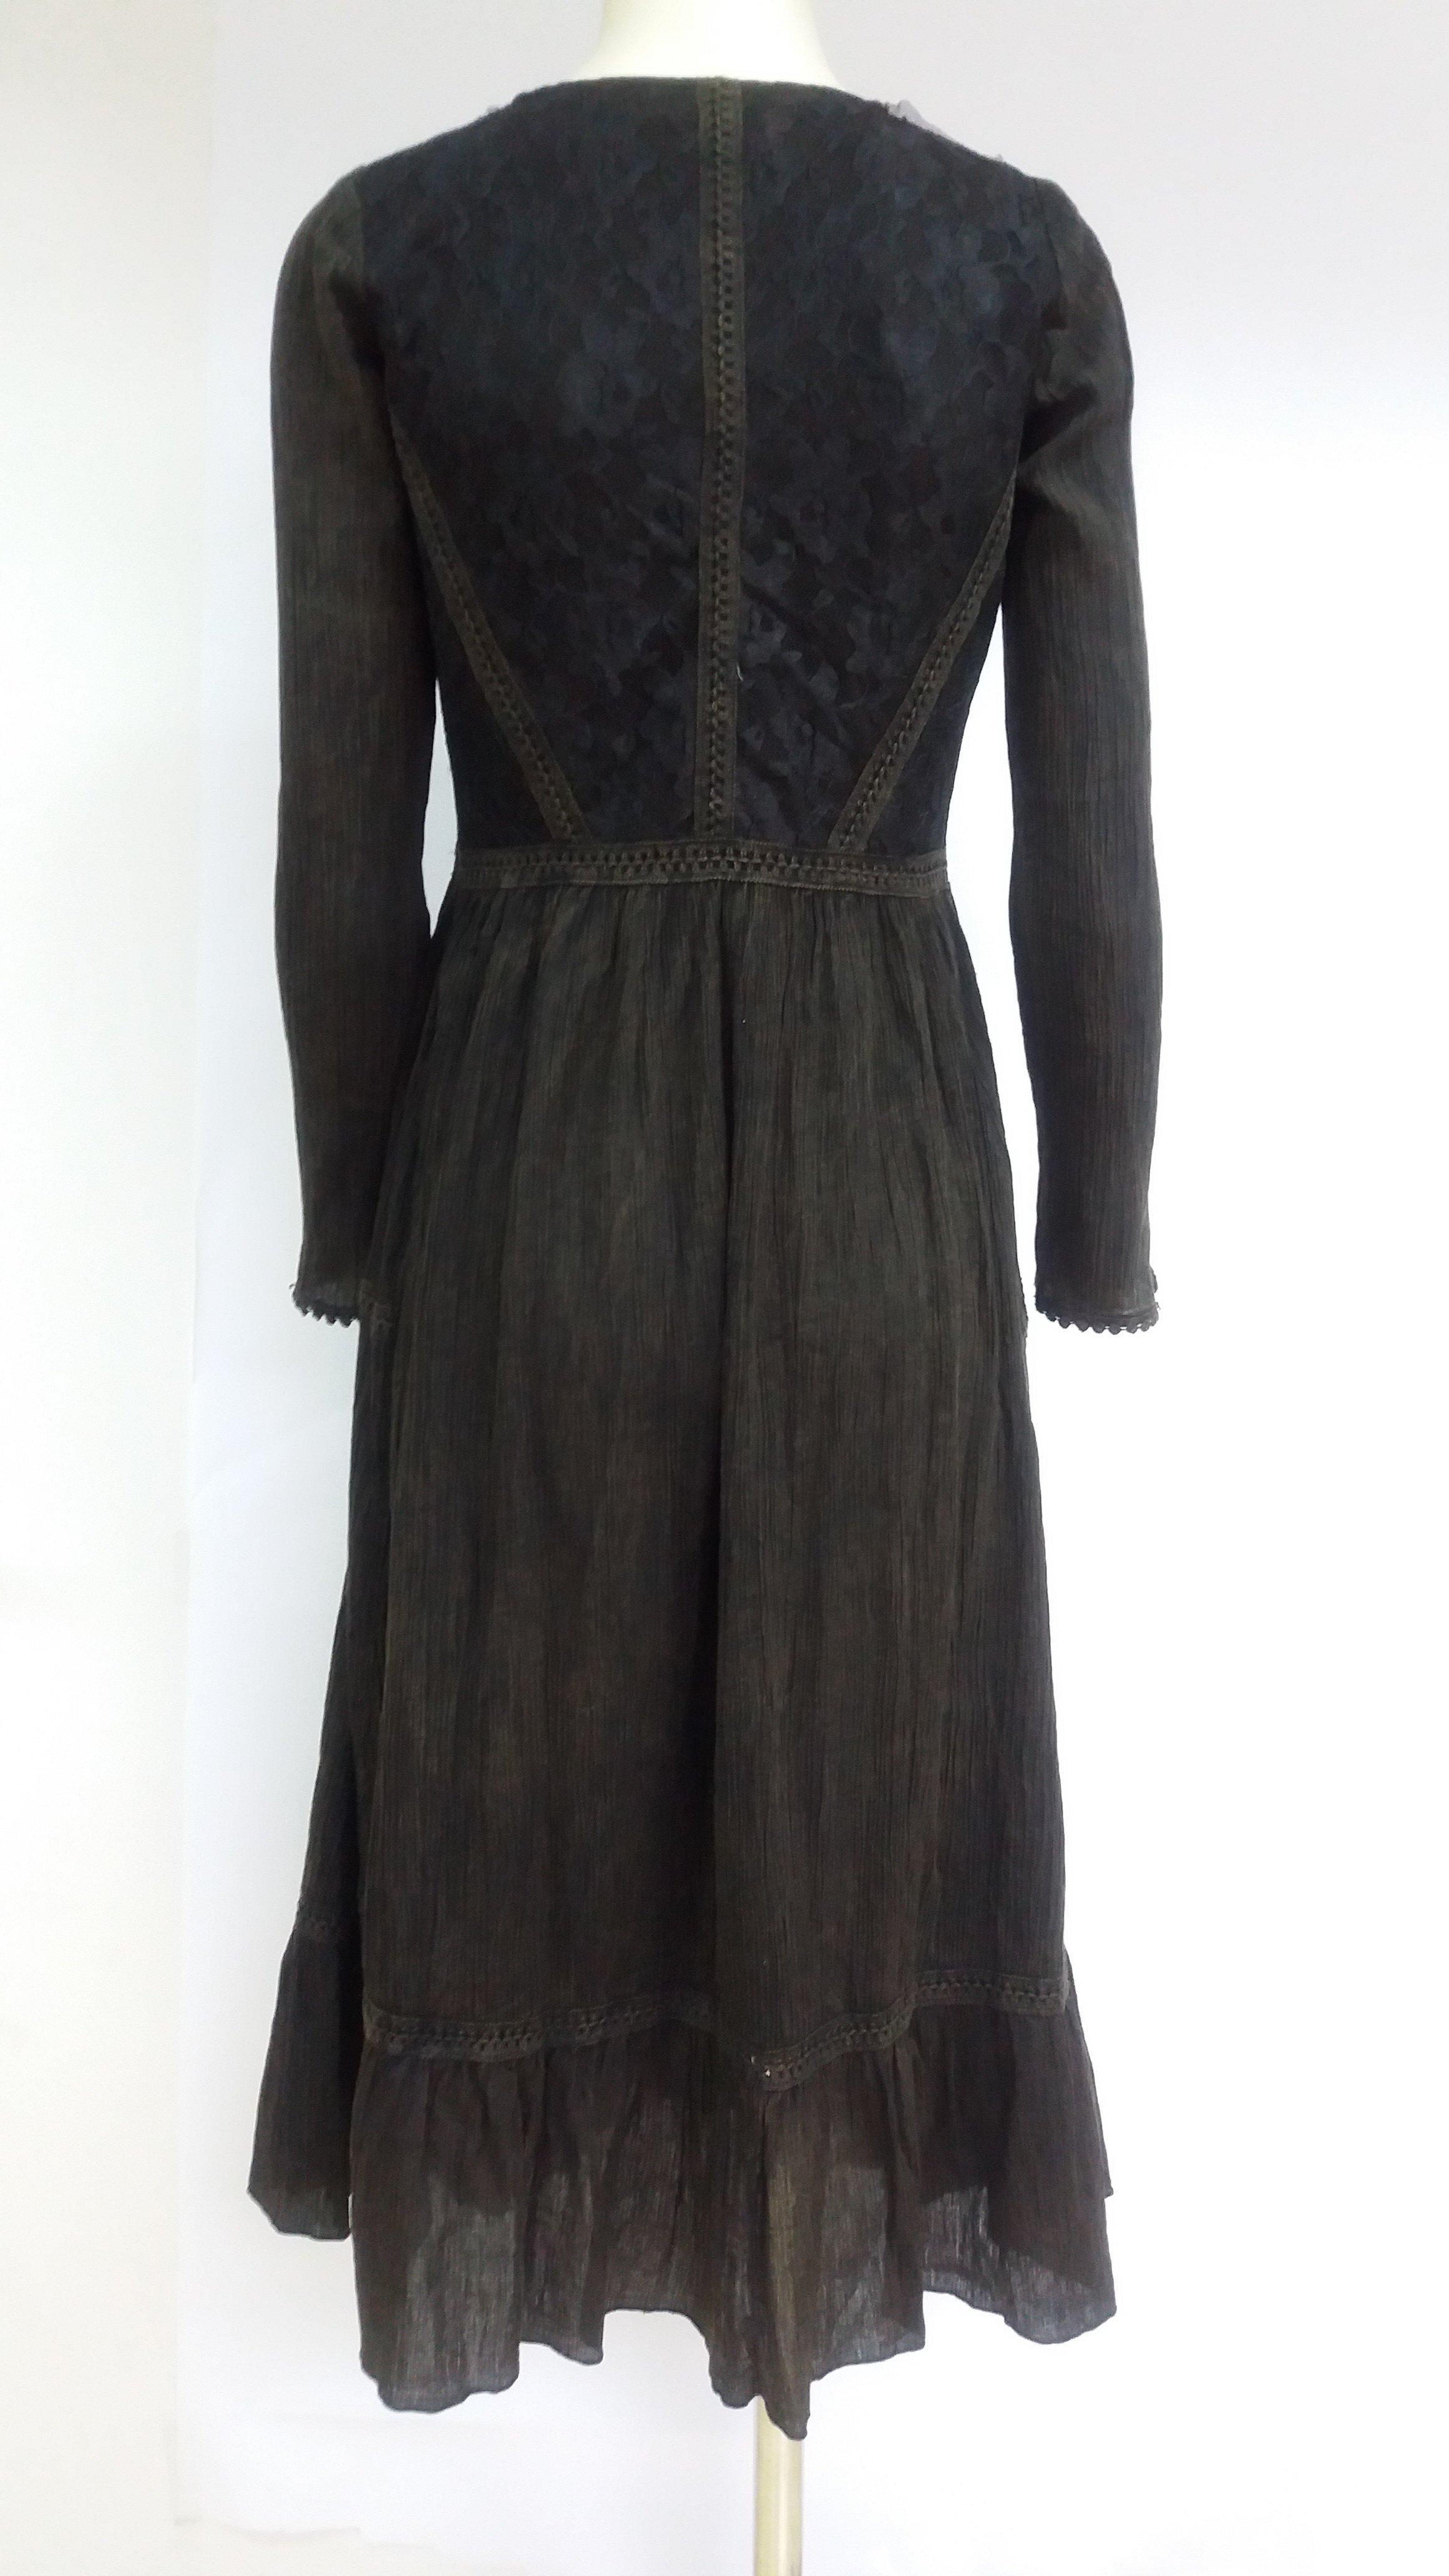 Savage Culture: Bittersweet Embroidered Truffle Midi Dress Antika